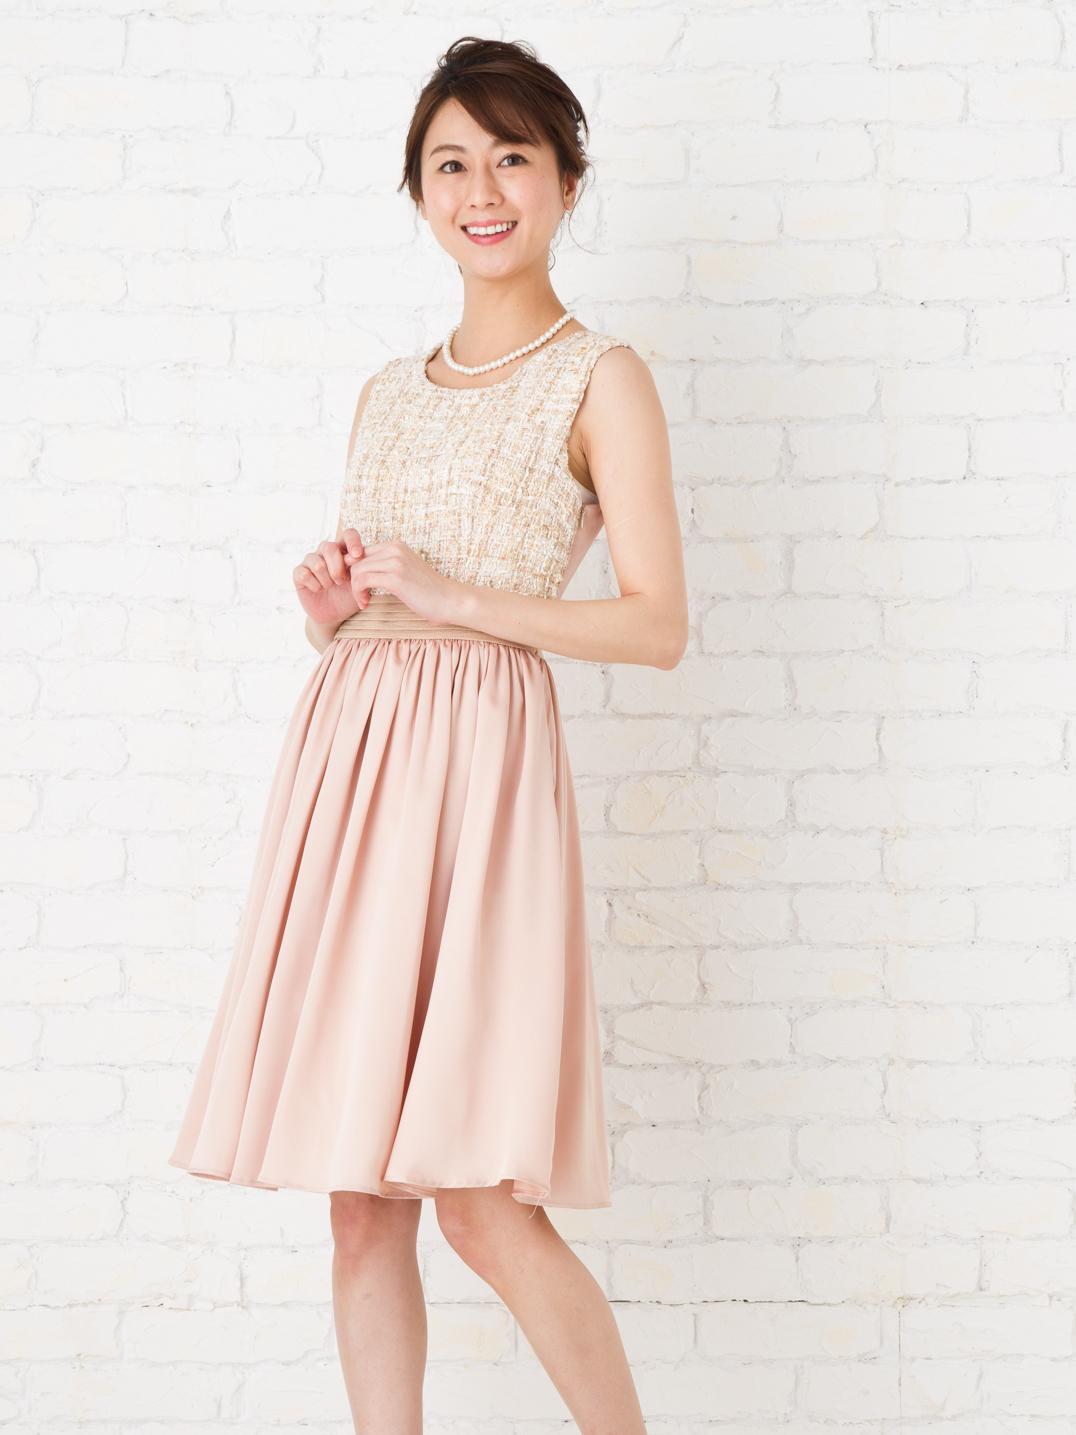 RYK ドレス / Mサイズ (DOC0002)